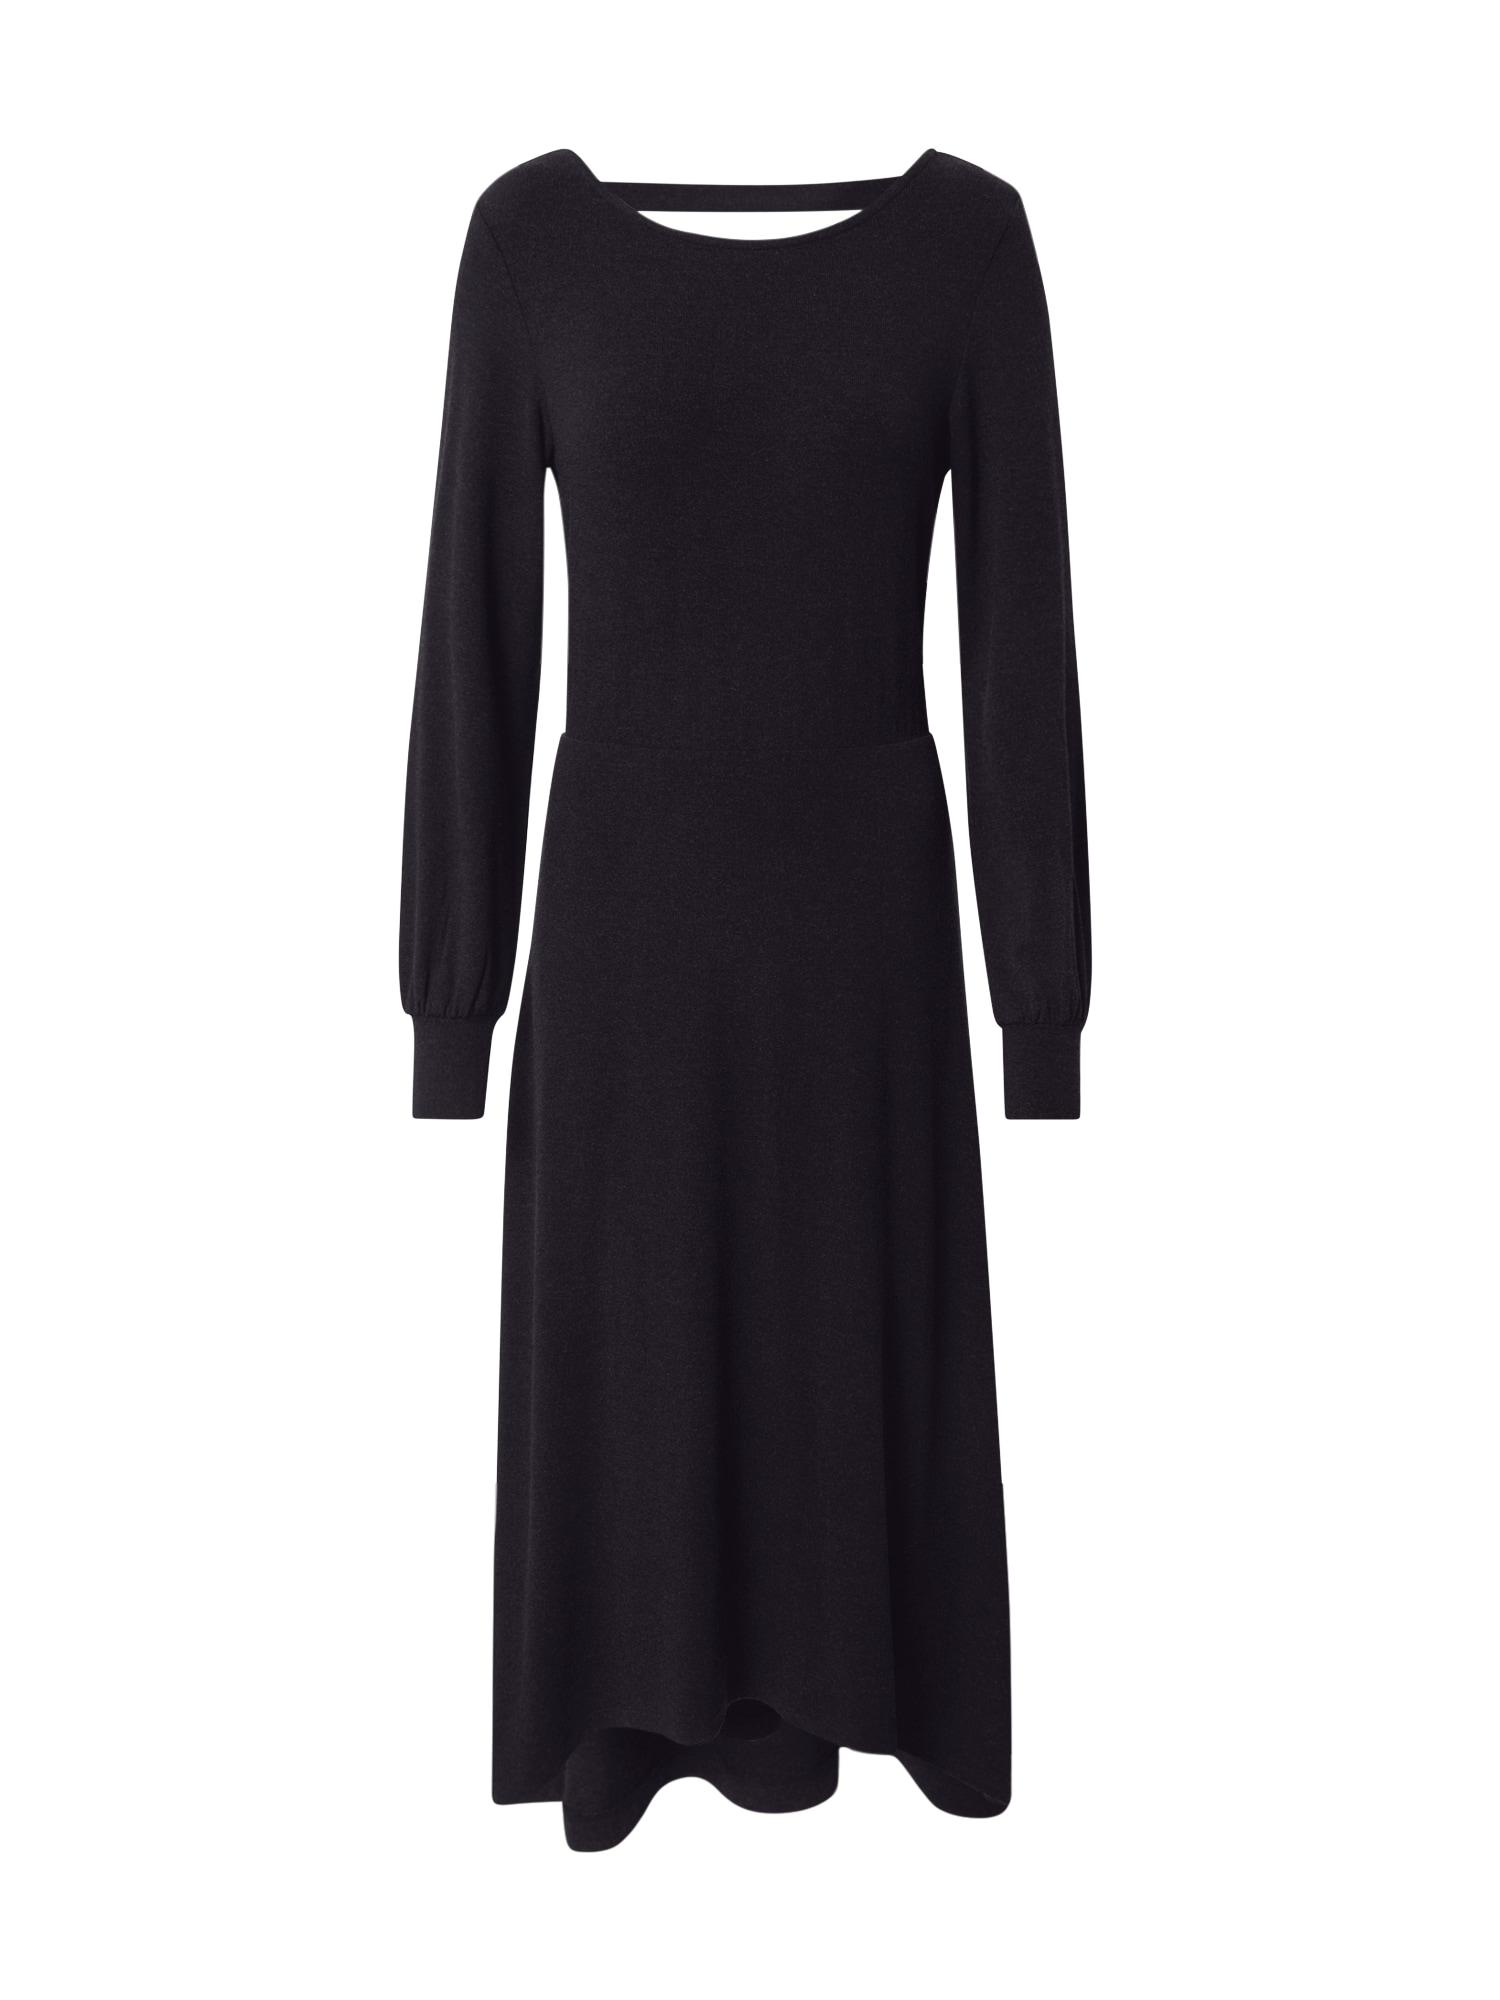 ESPRIT Suknelė 'Eco' juoda